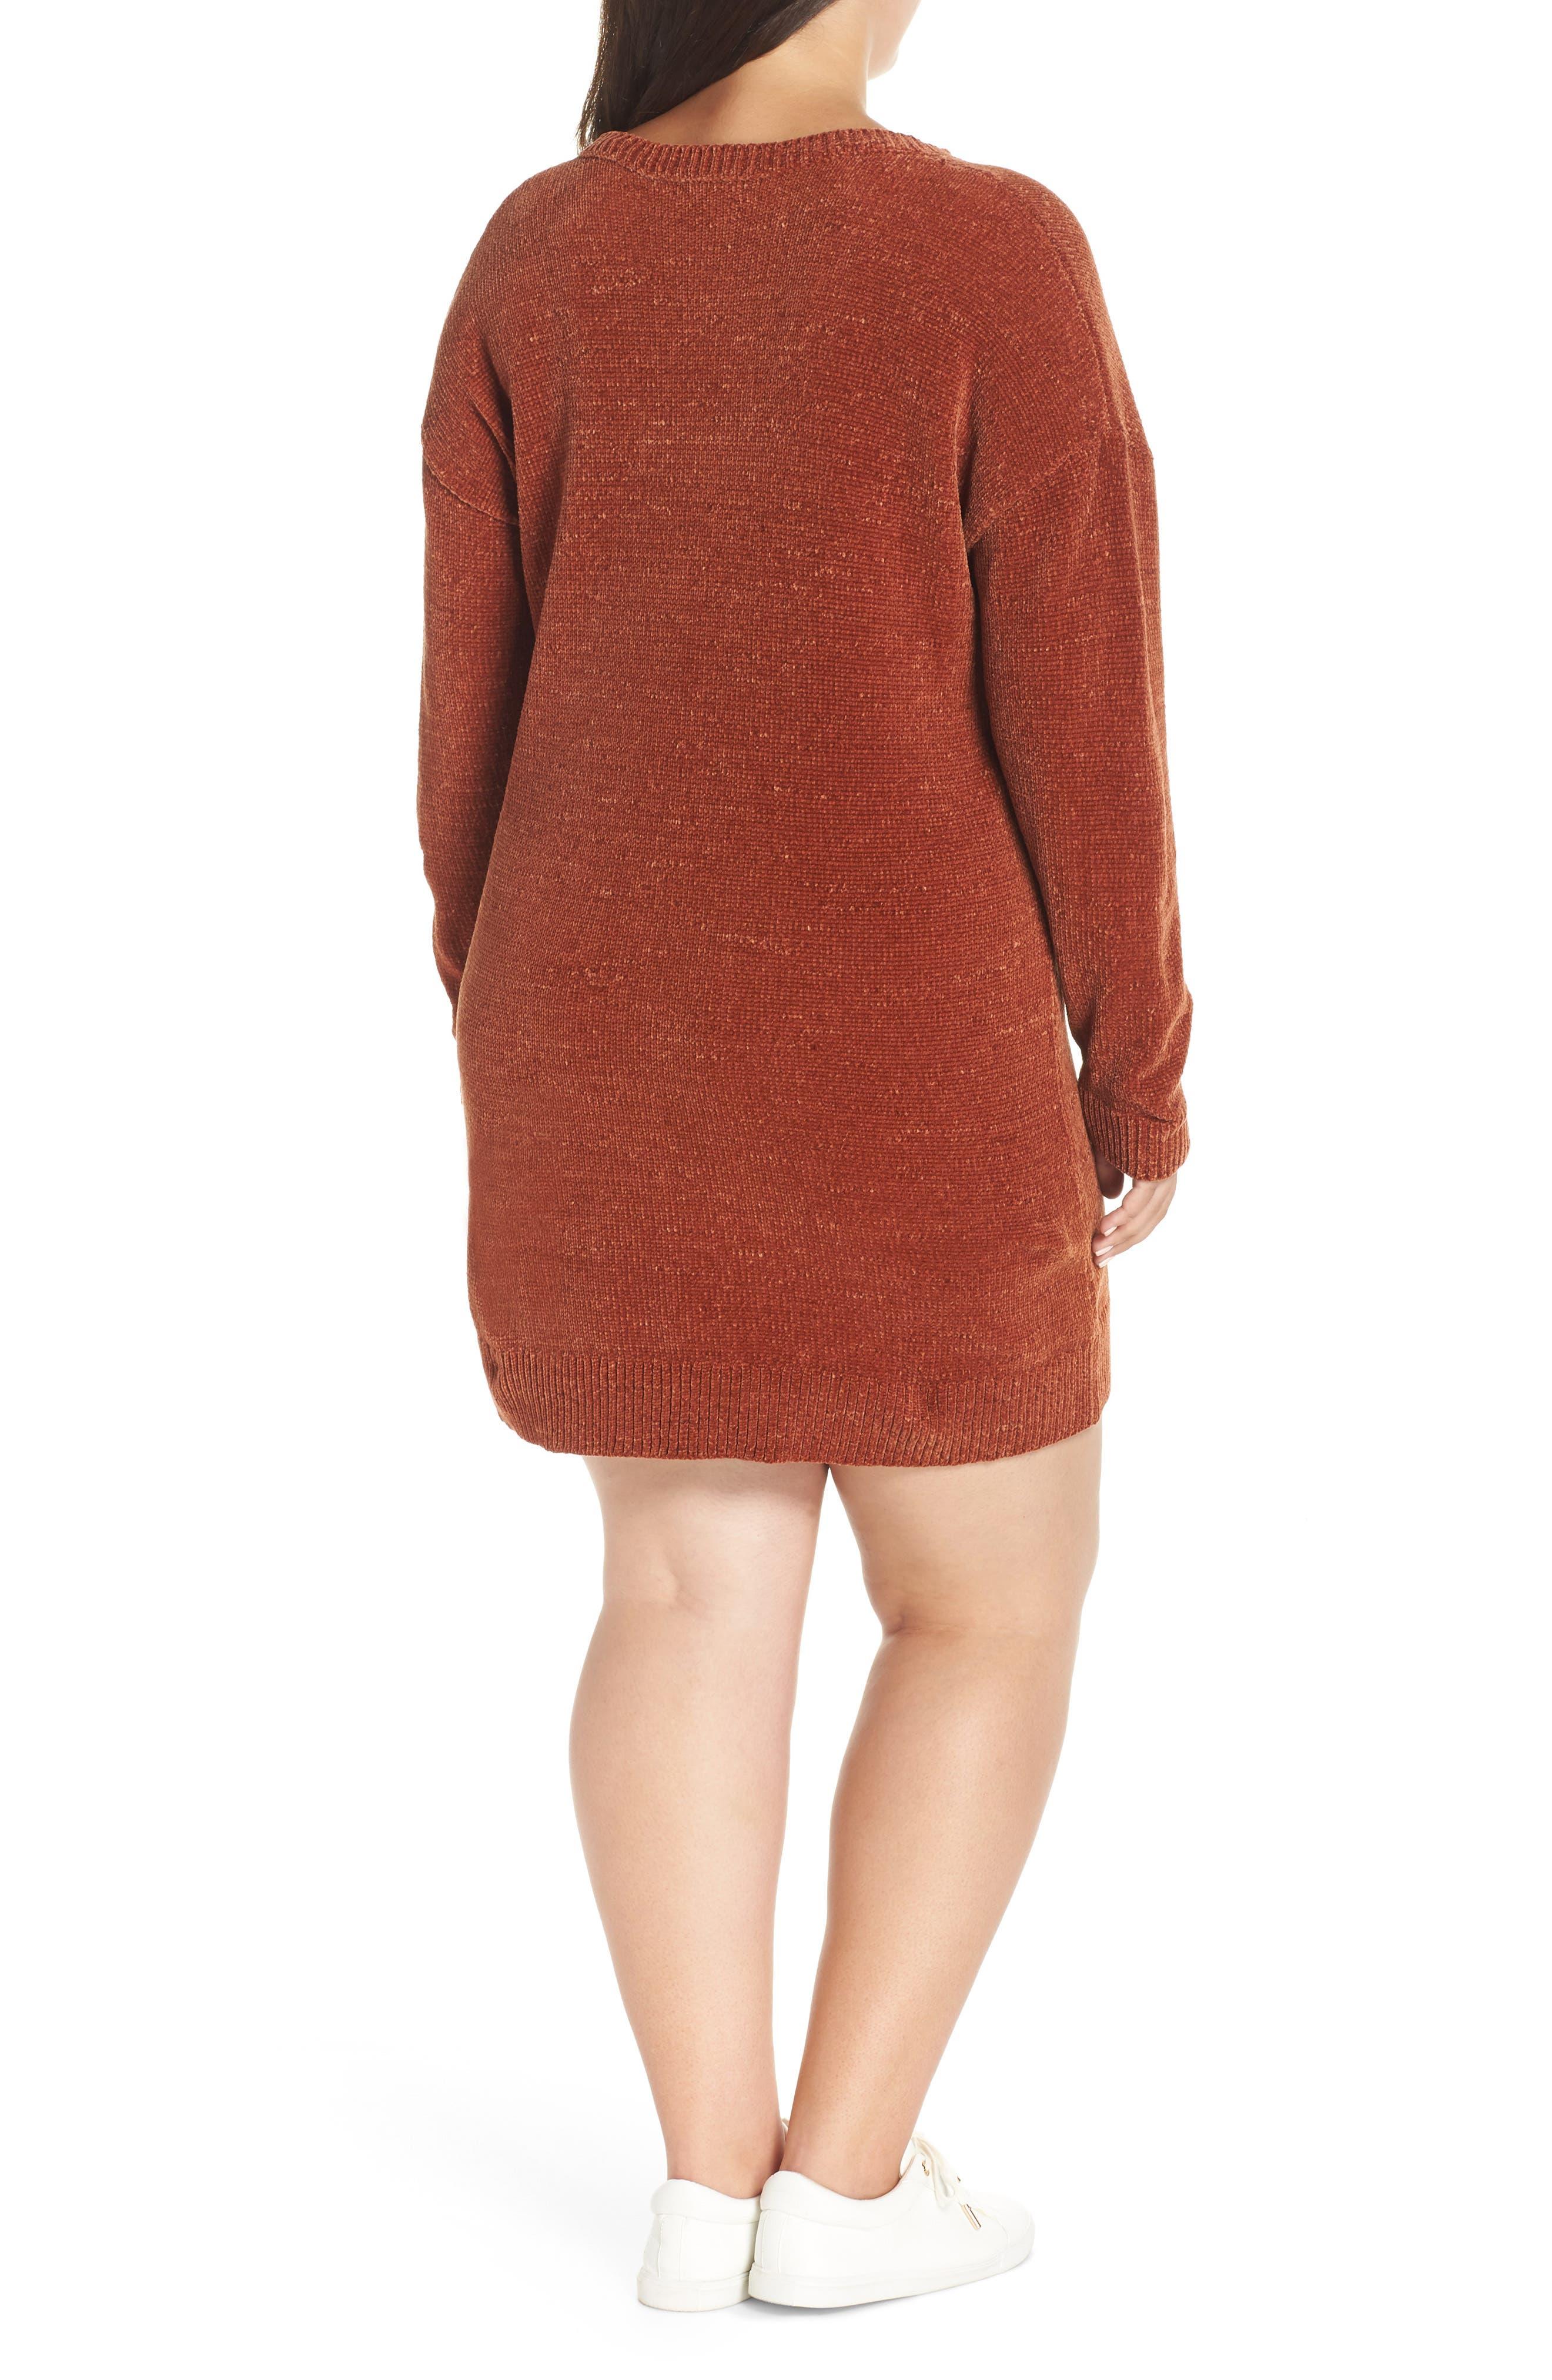 Chenille Sweater Dress,                             Alternate thumbnail 2, color,                             221